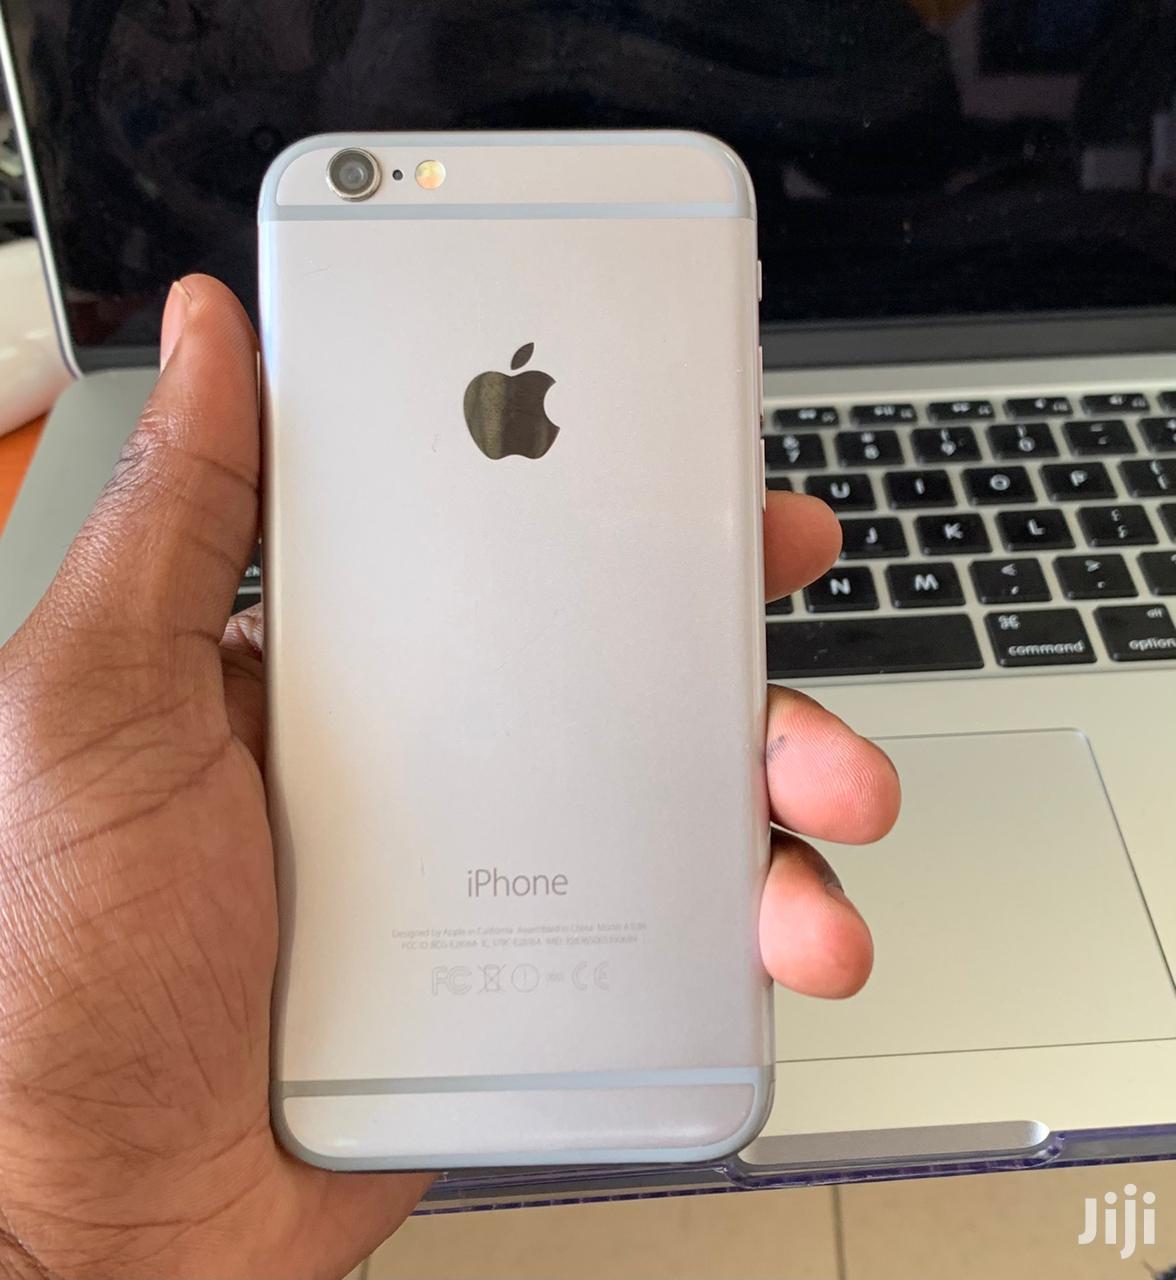 Apple iPhone 6 64 GB Gray   Mobile Phones for sale in Nairobi Central, Nairobi, Kenya